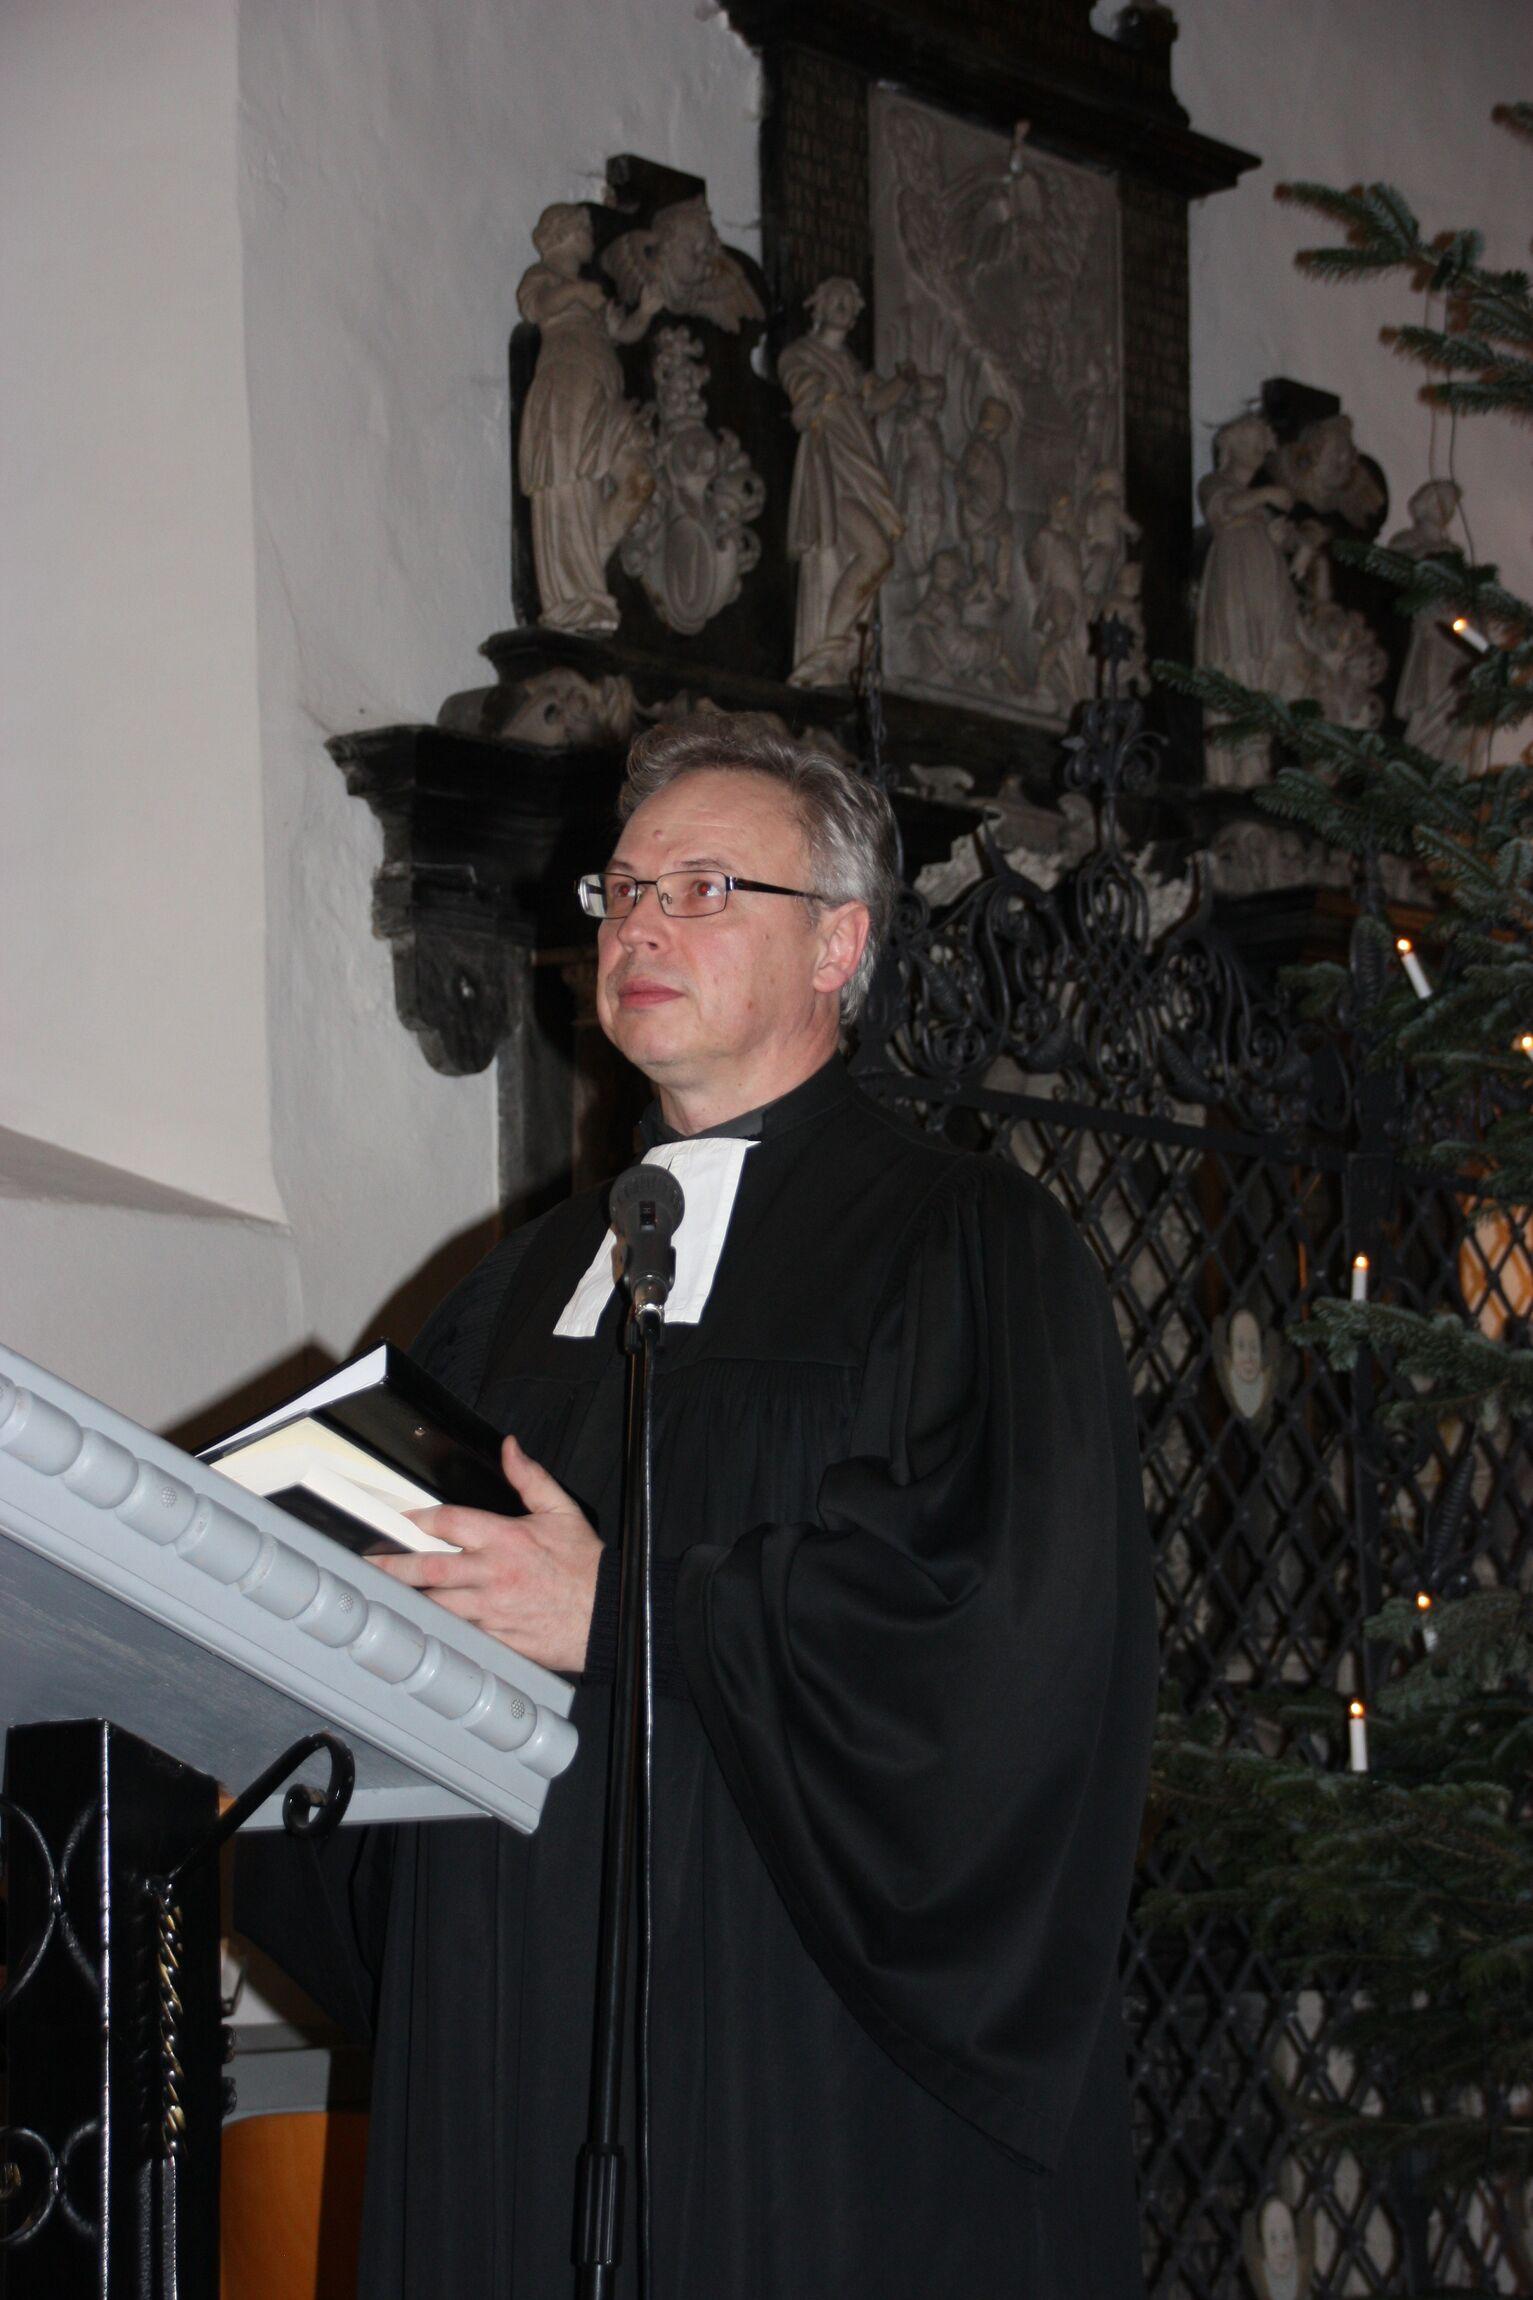 Pastor Jens-Arne Edelmann